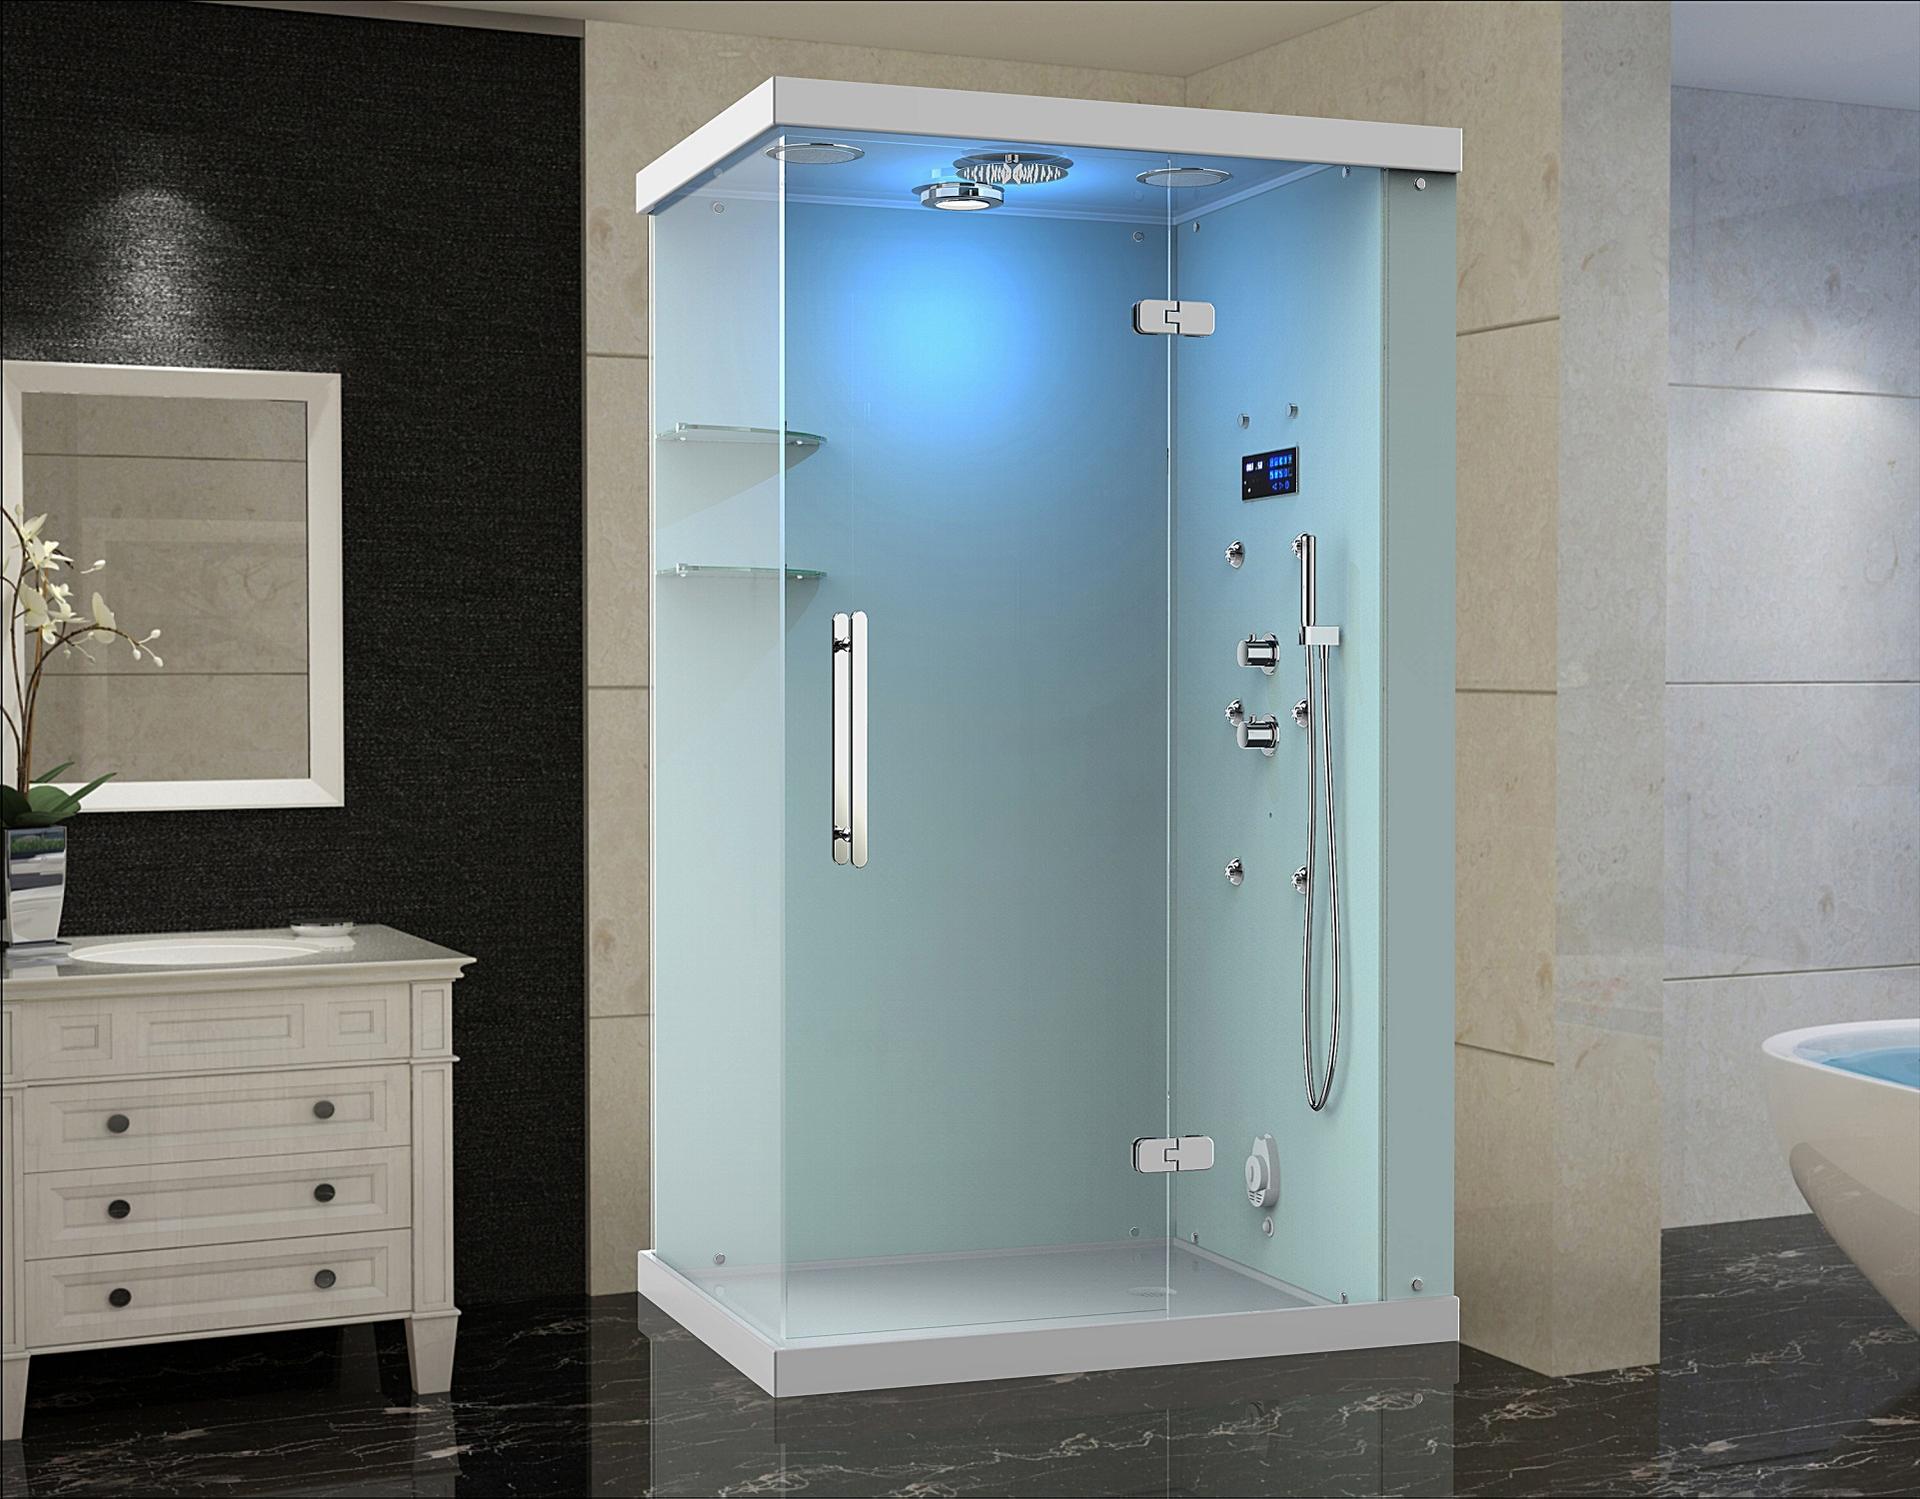 Ovato Steam Shower | For Residential Pros